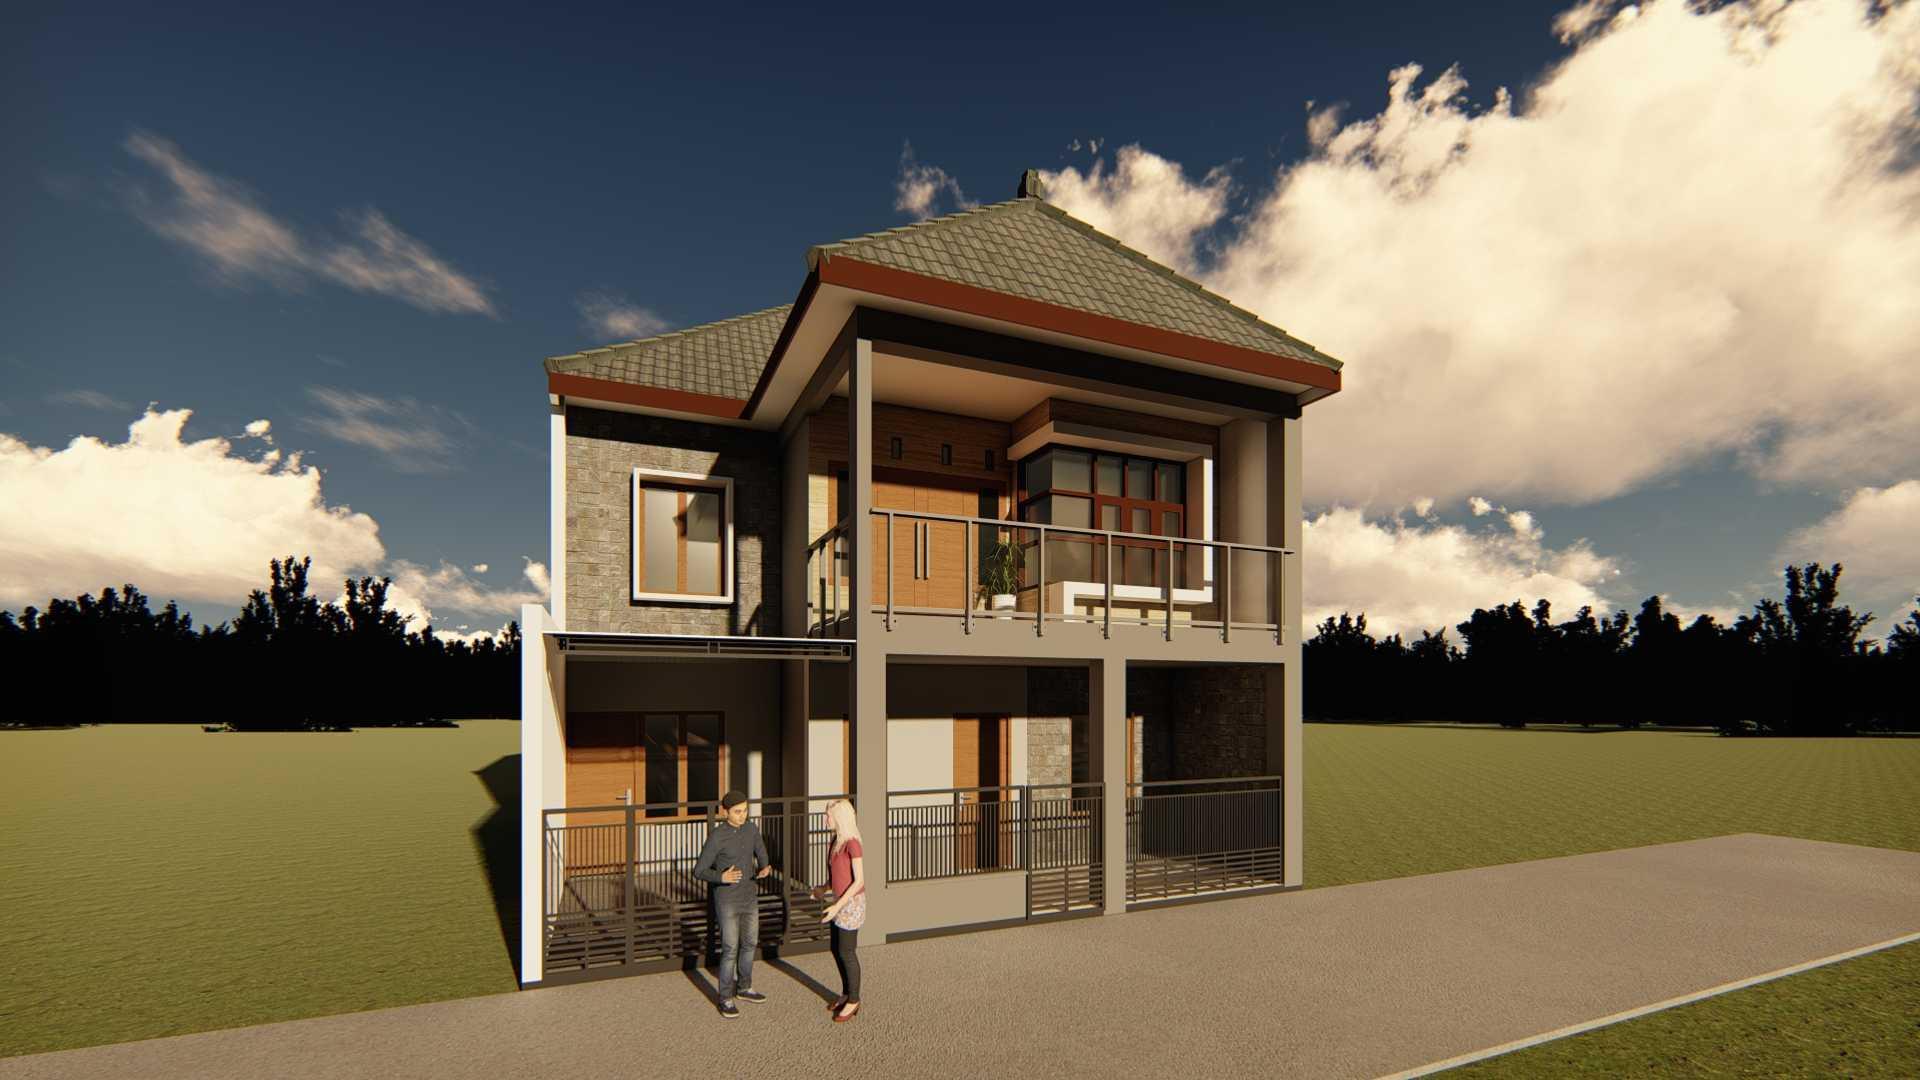 Astabumi Studio Ag House Wates Wates, Kabupaten Kulon Progo, Daerah Istimewa Yogyakarta, Indonesia Bali Cv-Astabumi-Manunggal-Prakarsa-Rb-House-Bandung  119296